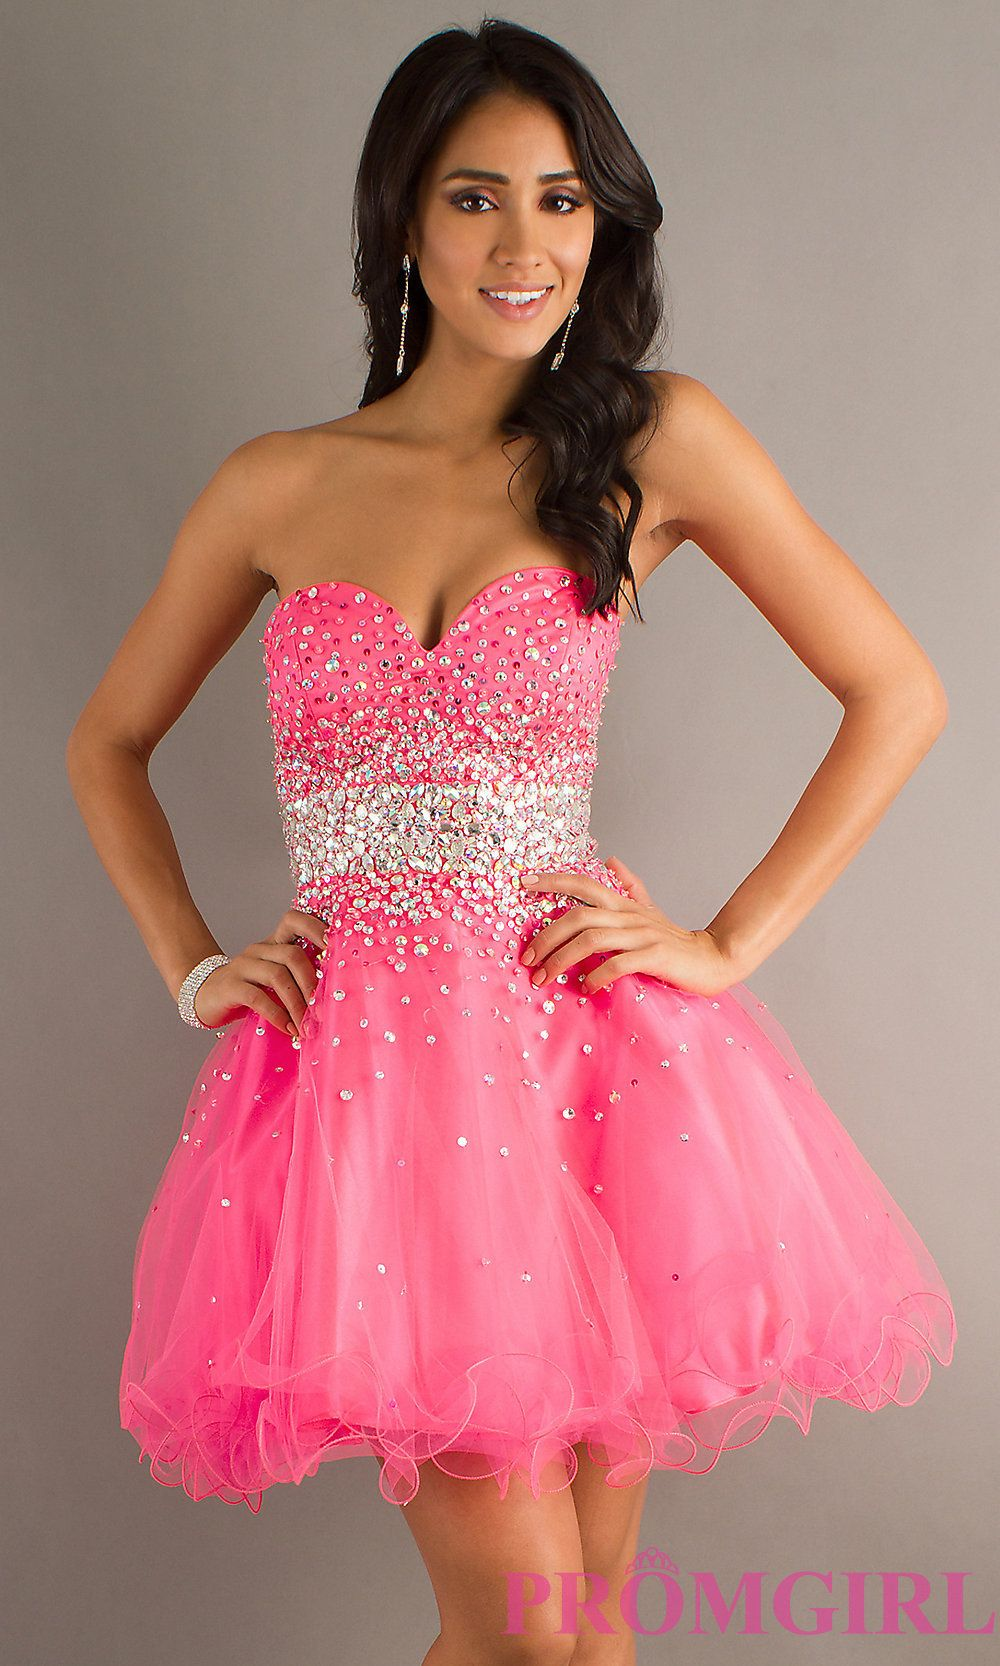 Prom dresses 2015, best prom dresses   inspire   Pinterest   Comprar ...